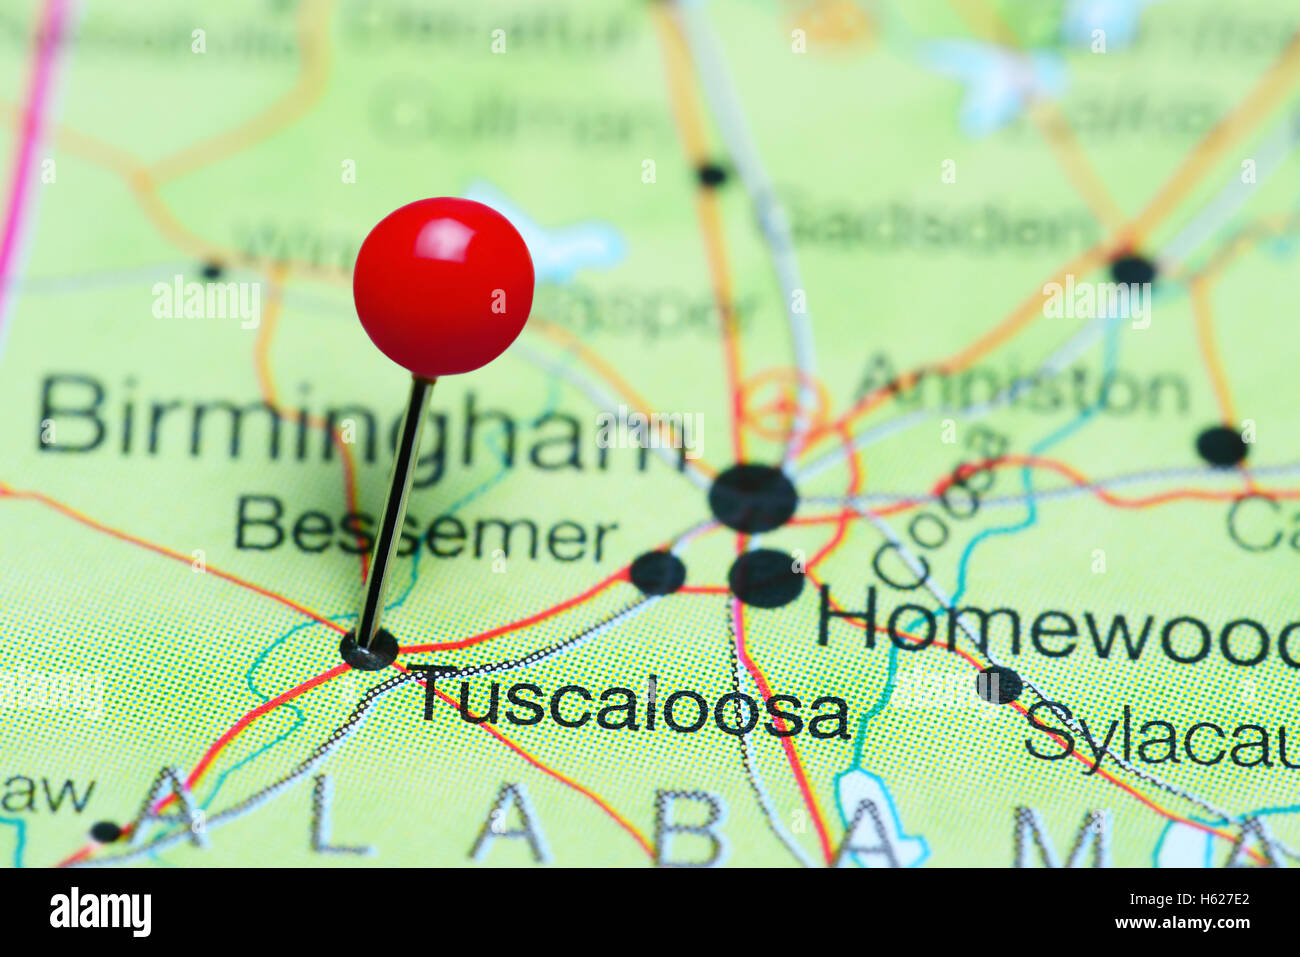 Tuscaloosa pinned on a map of Alabama, USA - Stock Image